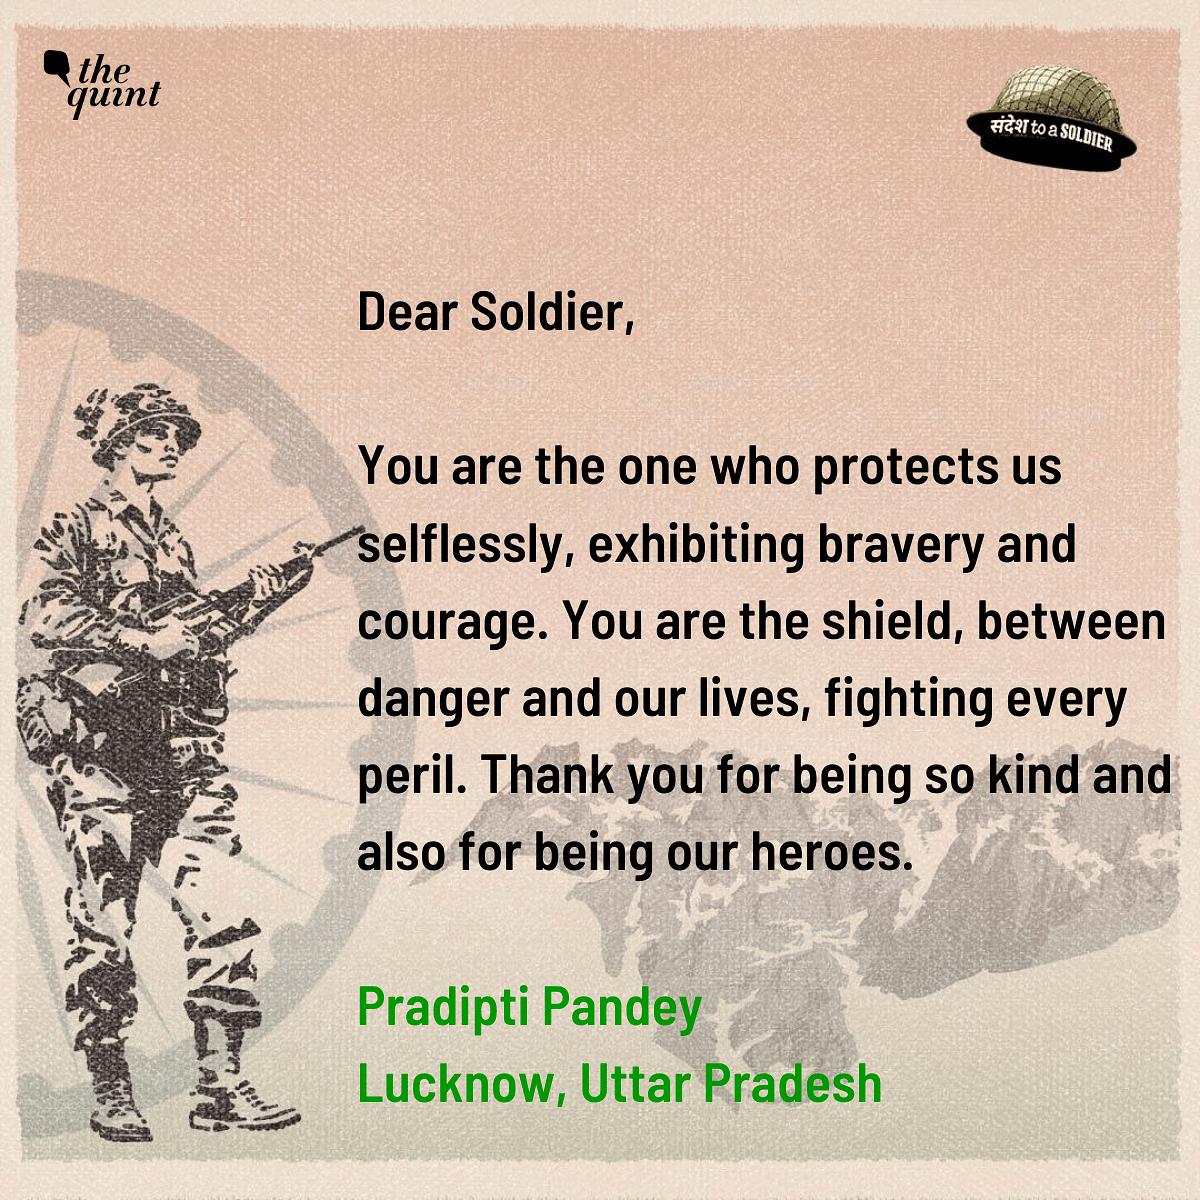 Pradipti Pandey from Uttar Pradesh sends her sandesh to a soldier.